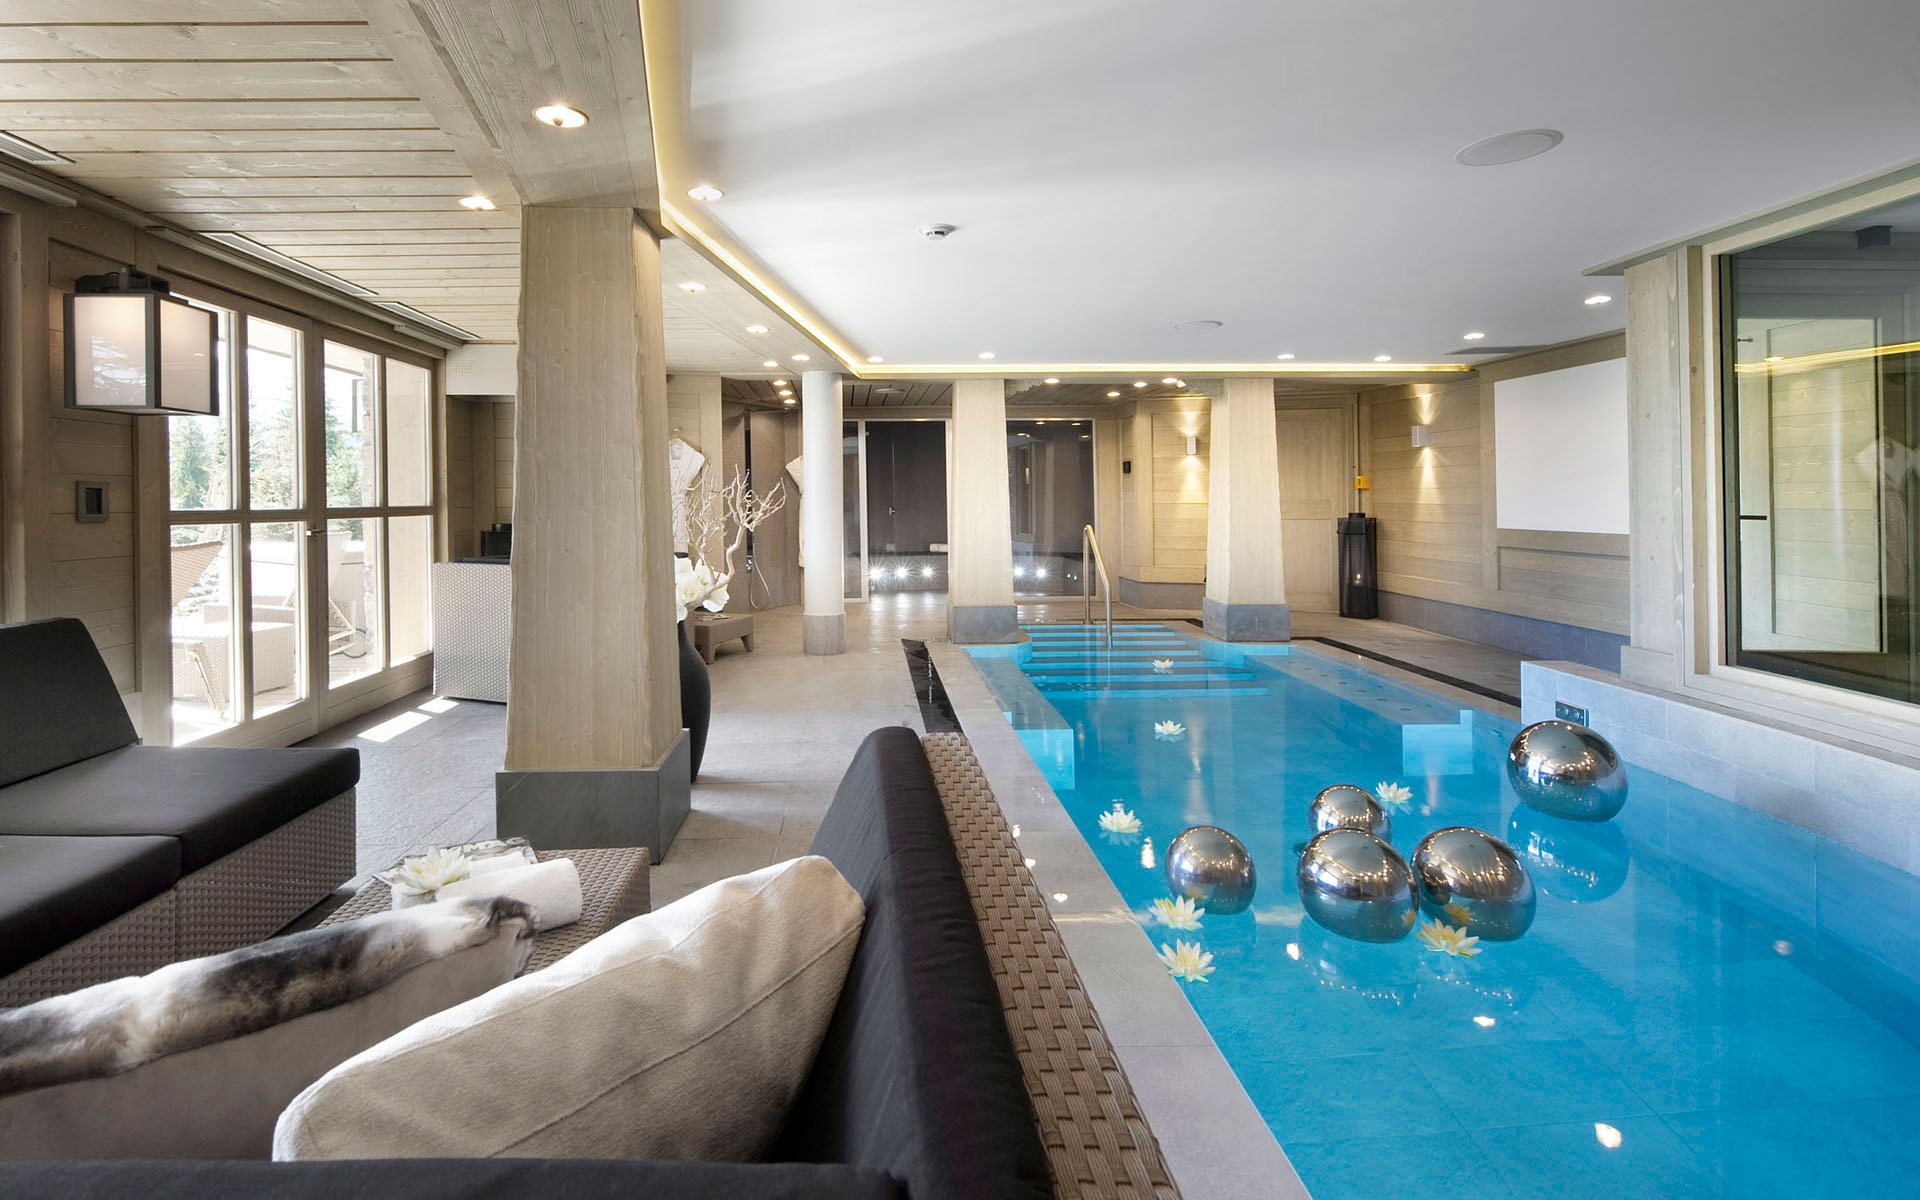 Indoor Swimming Pool Luxury Ski Chalet In Courchevel 1850